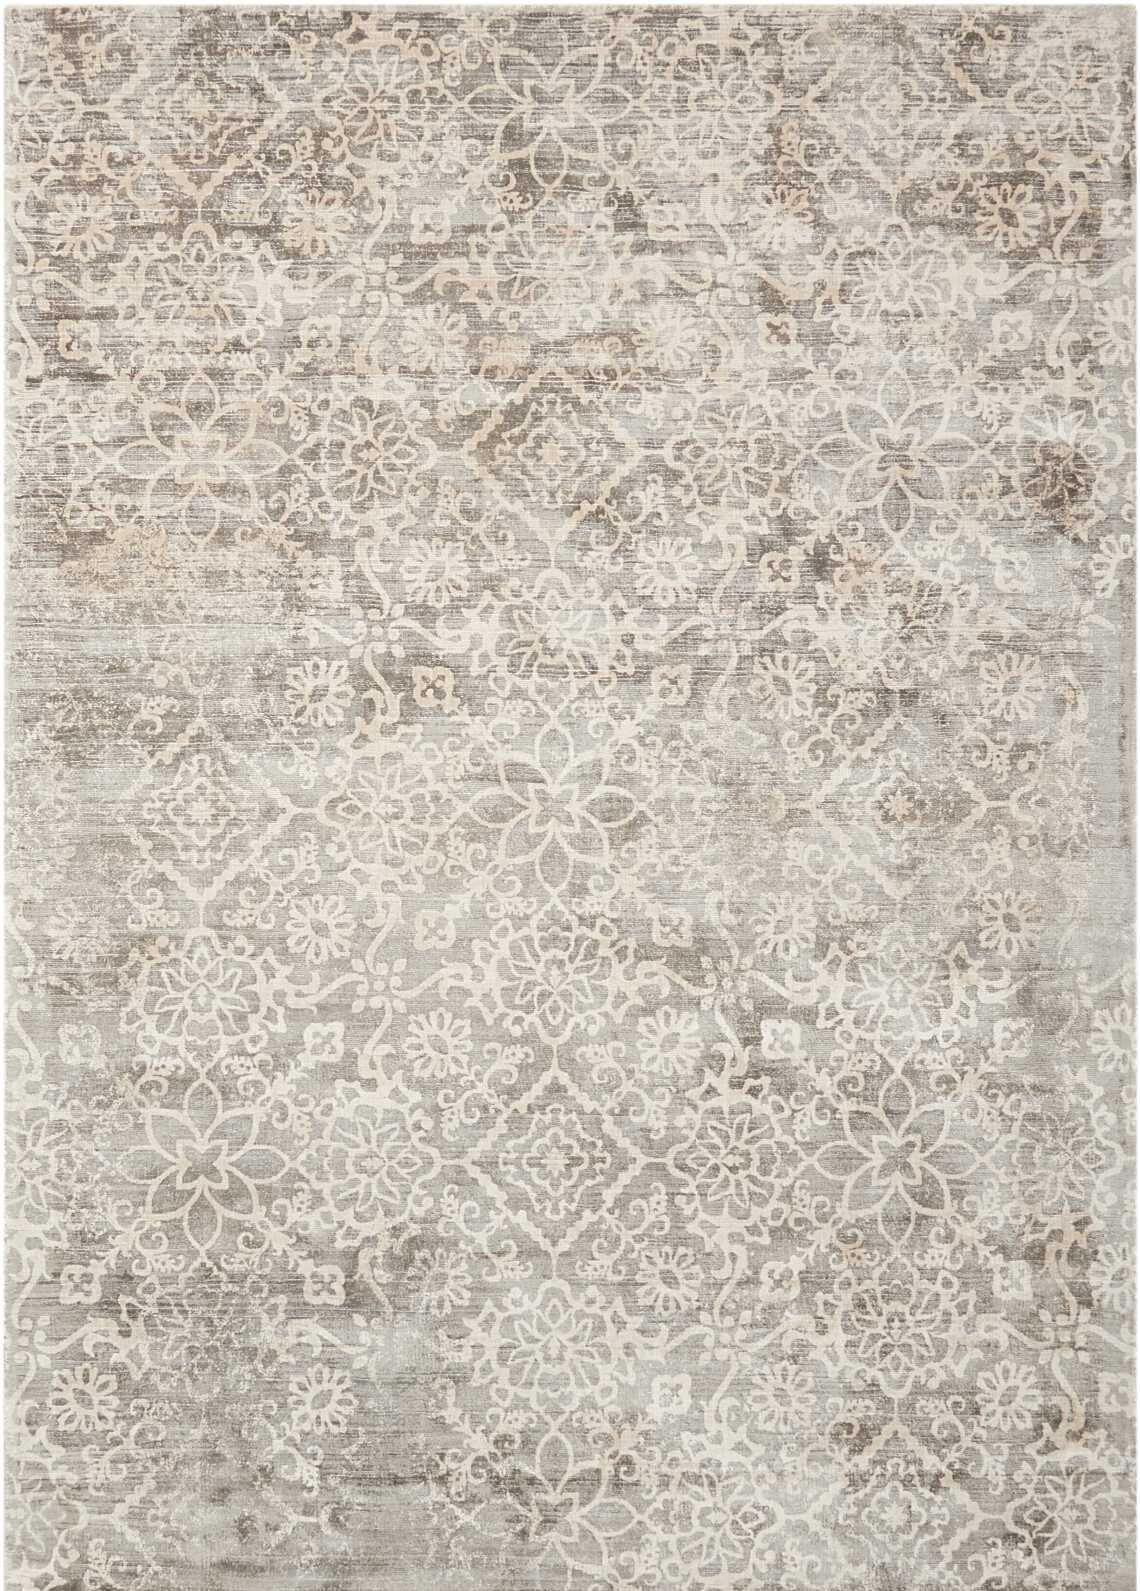 Desert Skies Hand-Loomed Gray Area Rug Rug Size: Rectangle 5'3